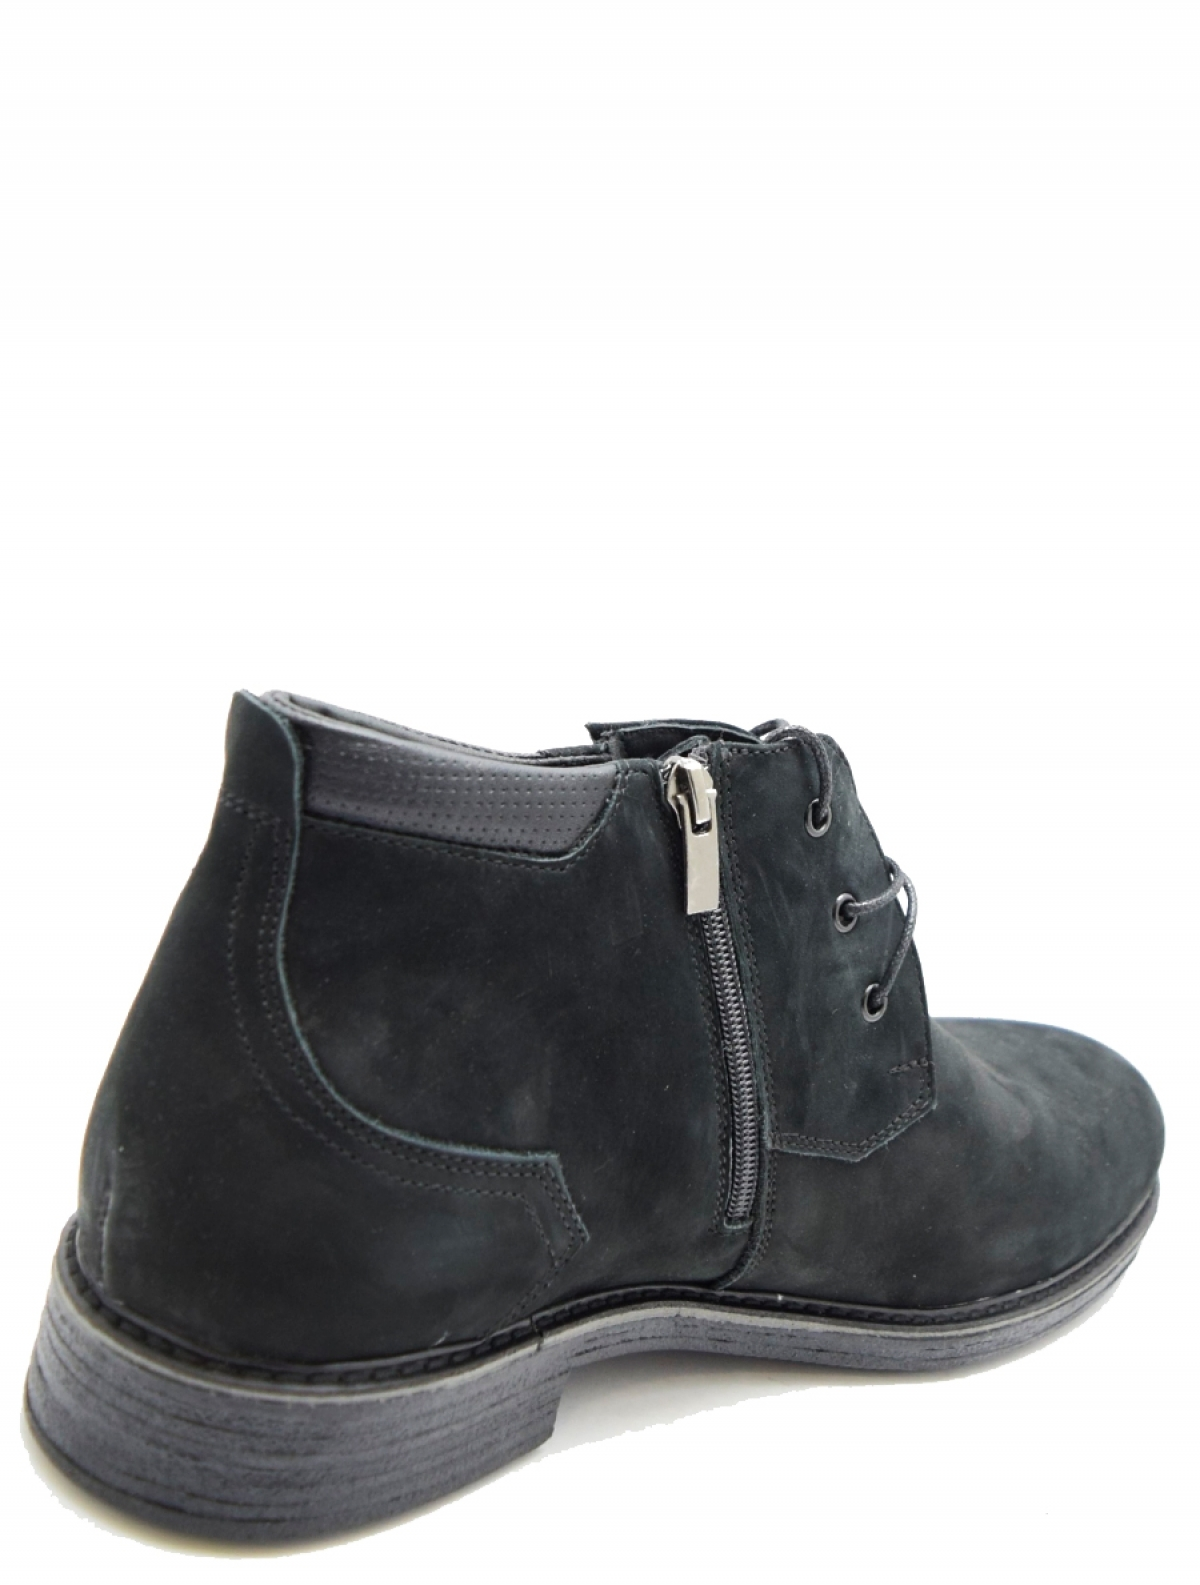 Bossner 602-102-2 мужские ботинки